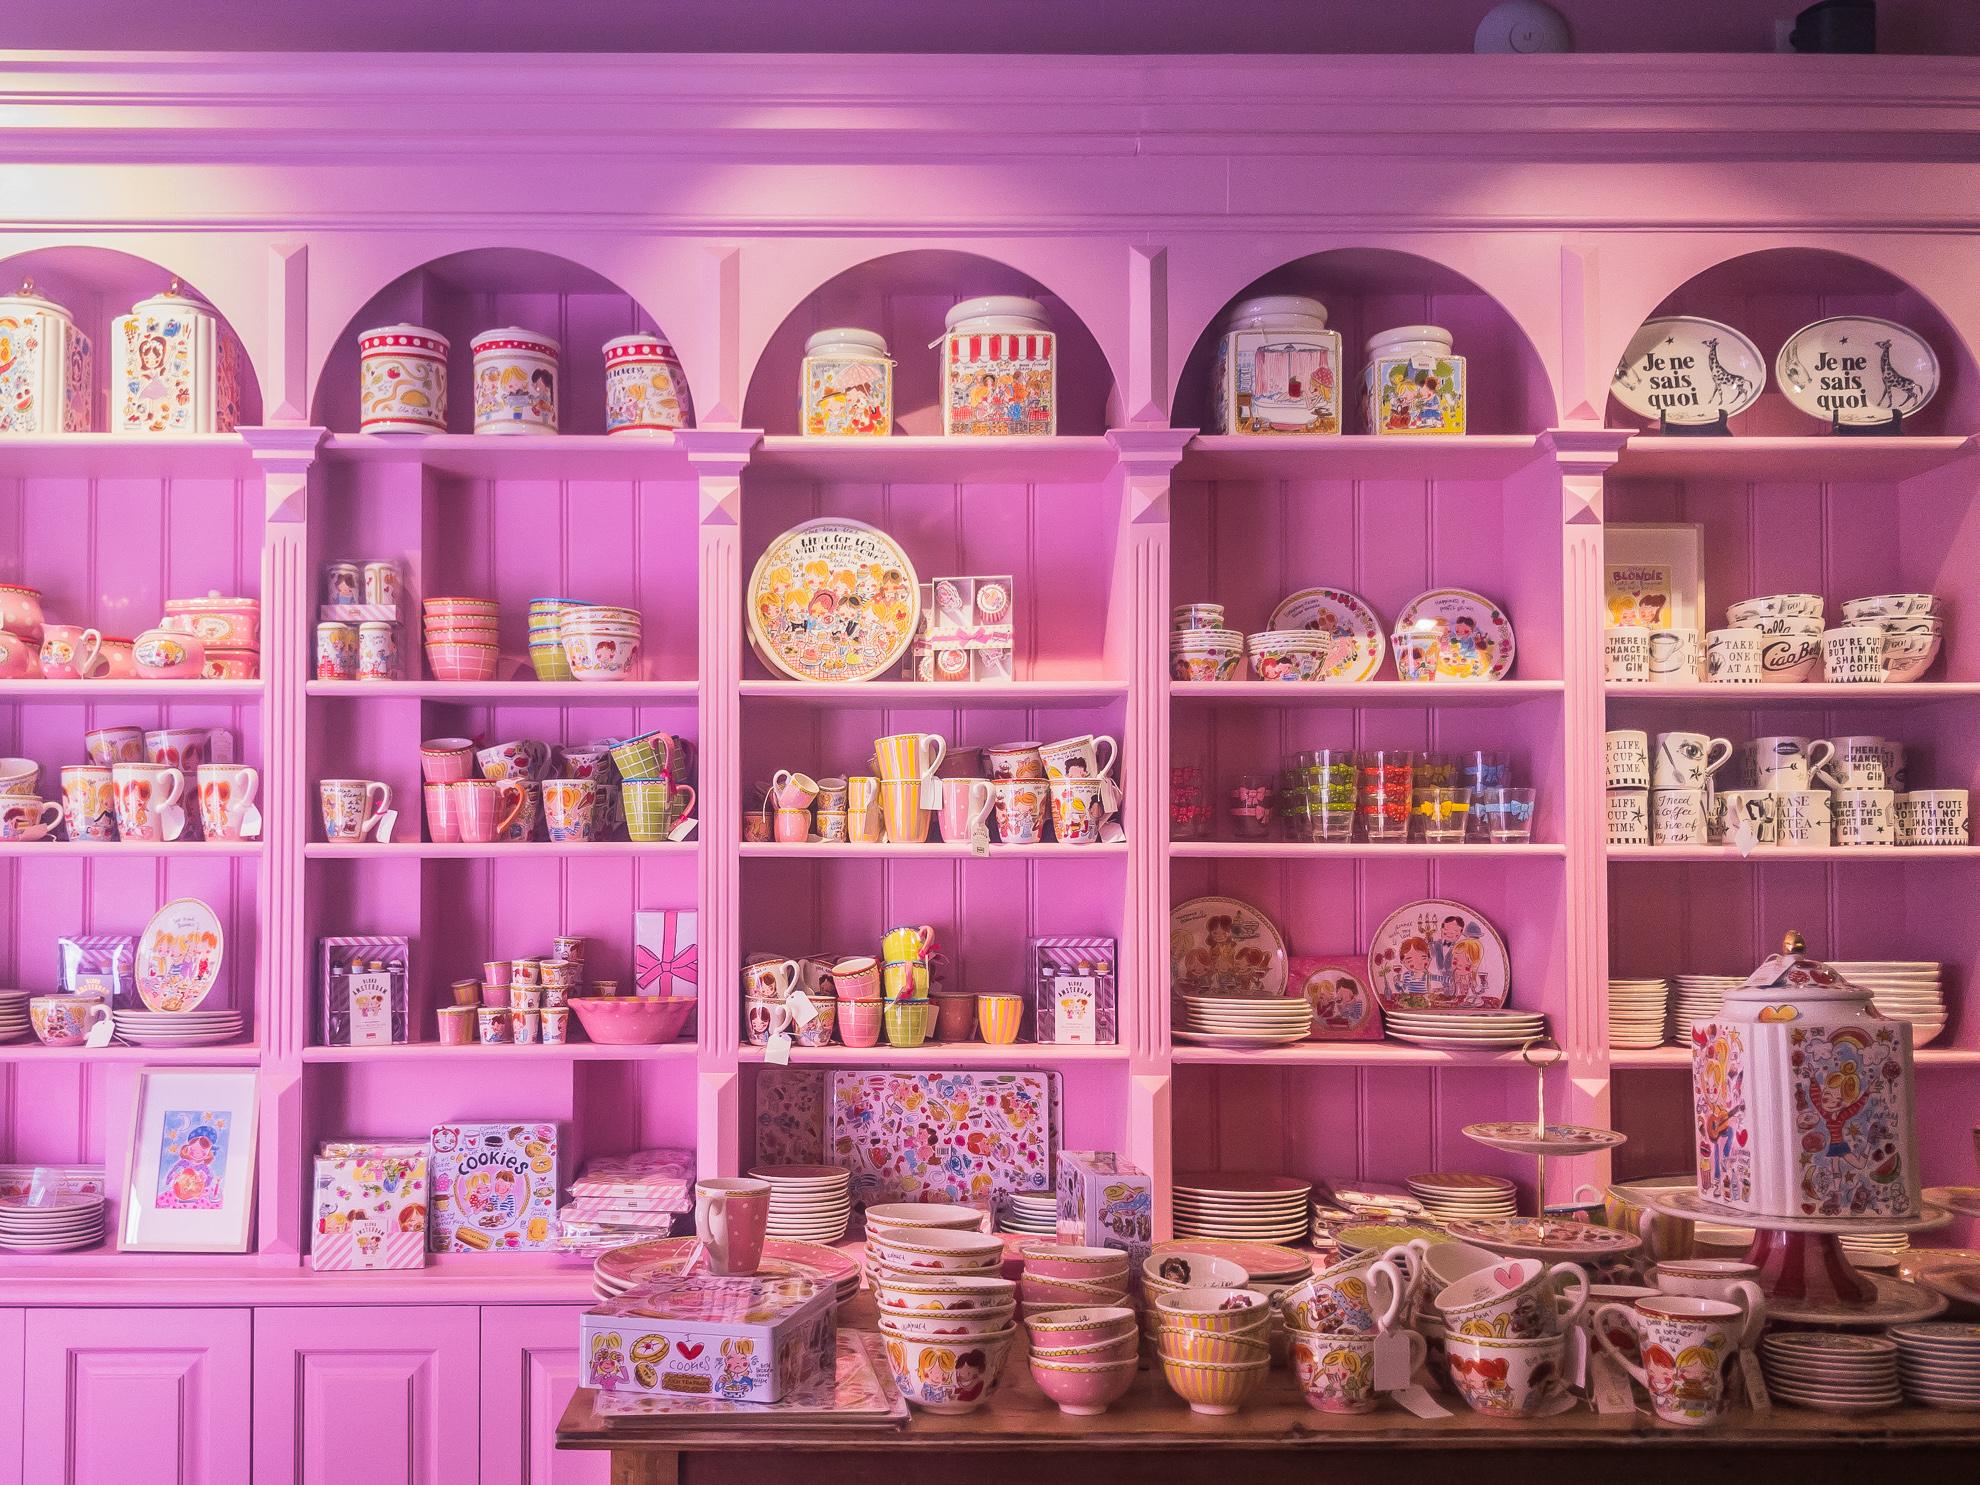 Blond Amsterdam Interior Shelving Display Pink.jpg